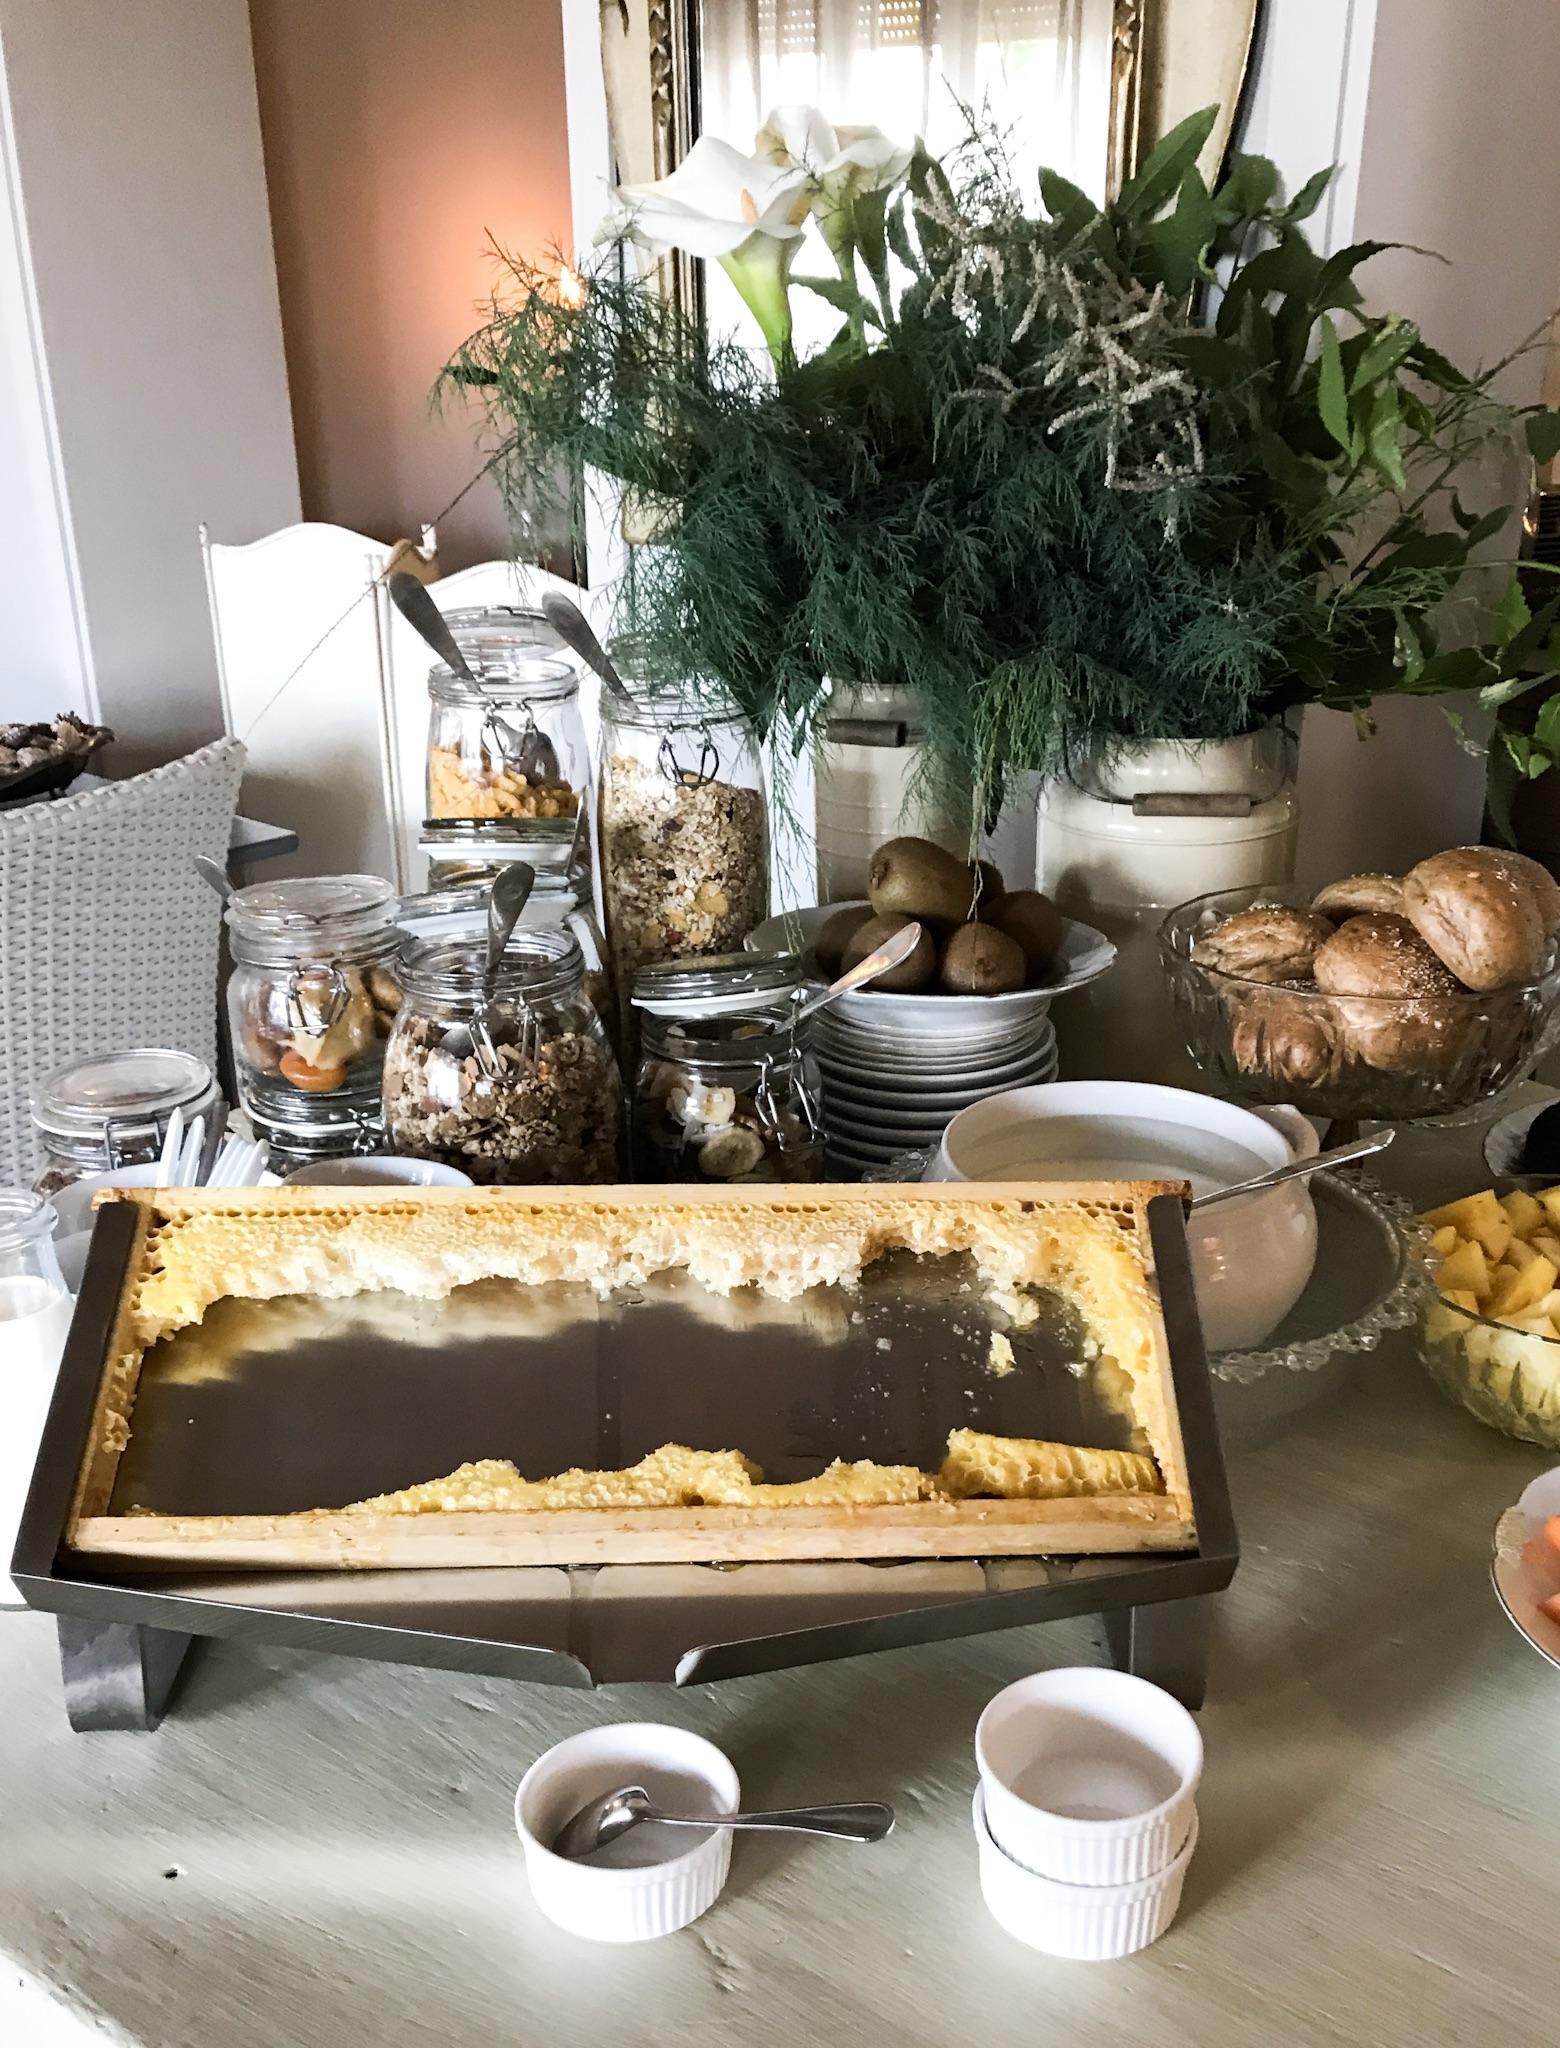 Hotel Stresa Cesenatico sweet lavanda blog